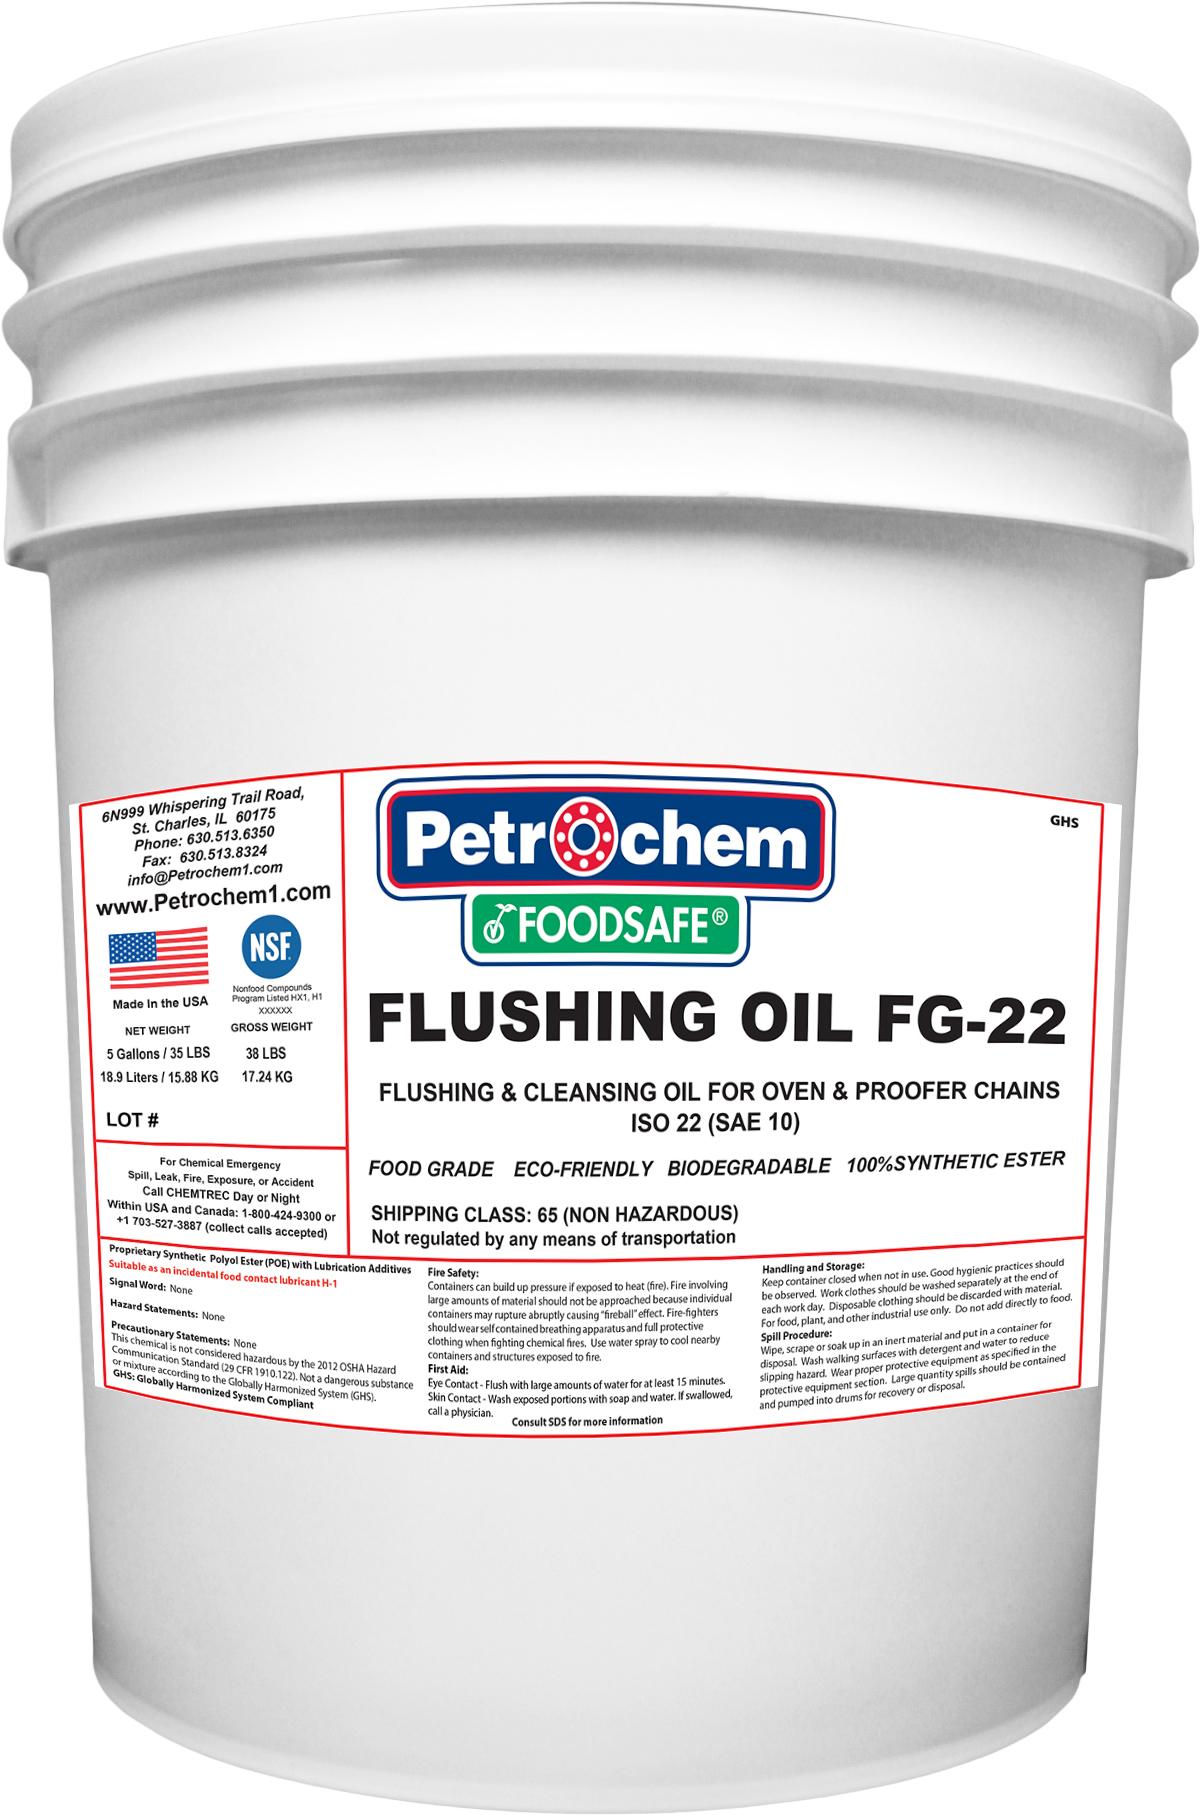 flushing oil FG-22 5gal pail